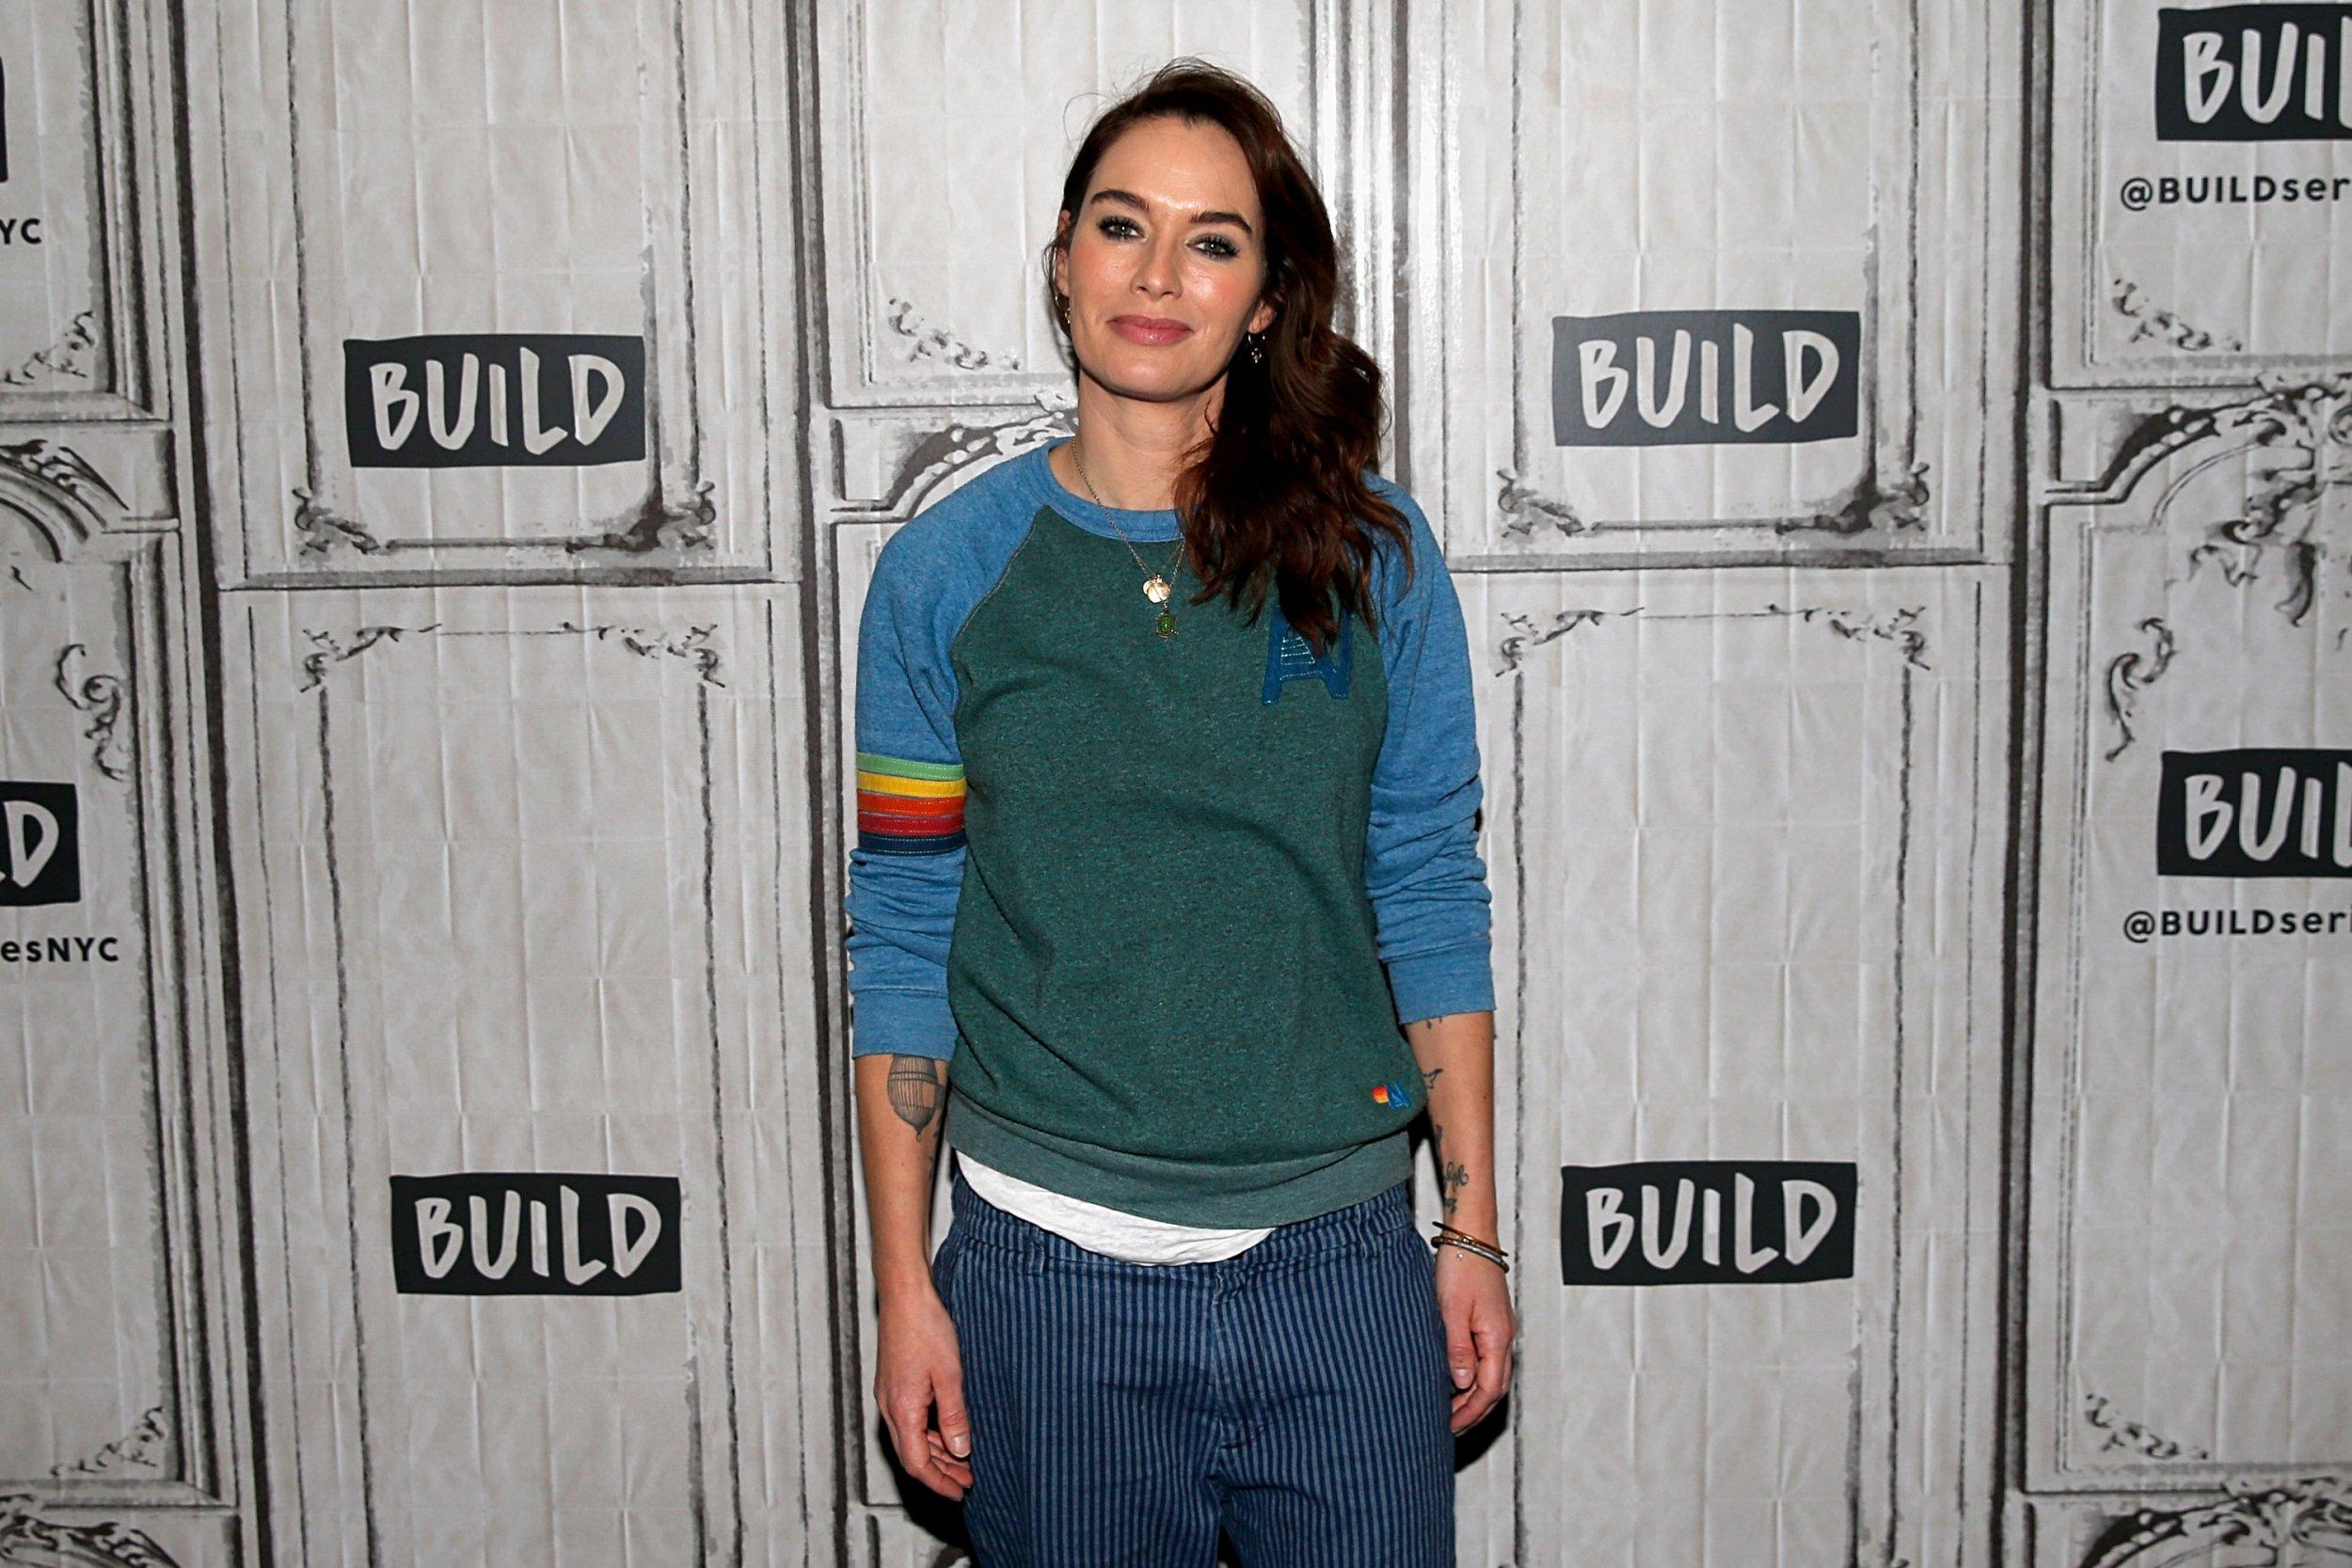 Lena Headey was 'heartbroken' to miss the big Game of Thrones premiere